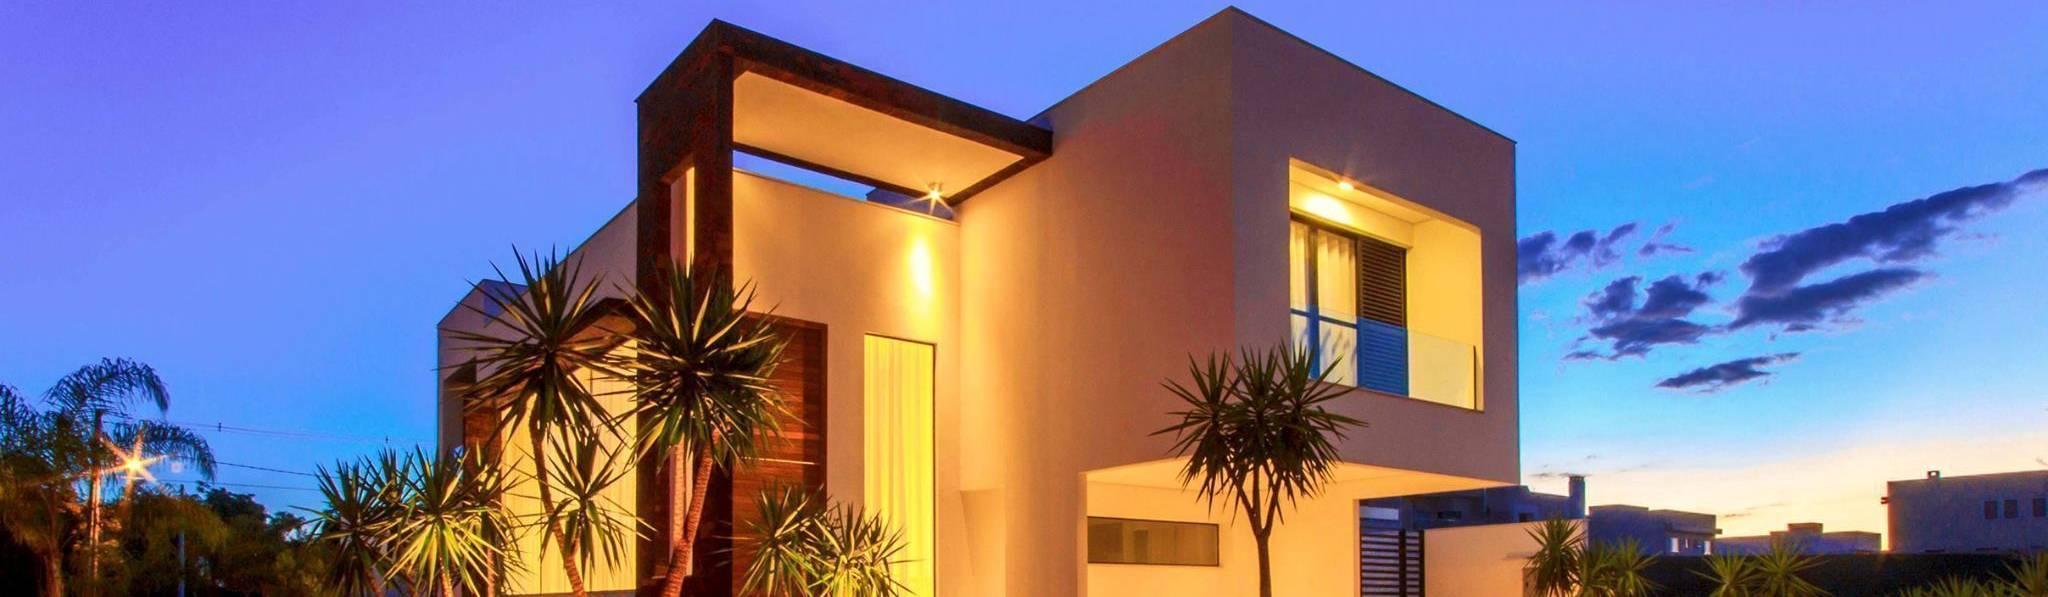 Tony Santos Arquitetura